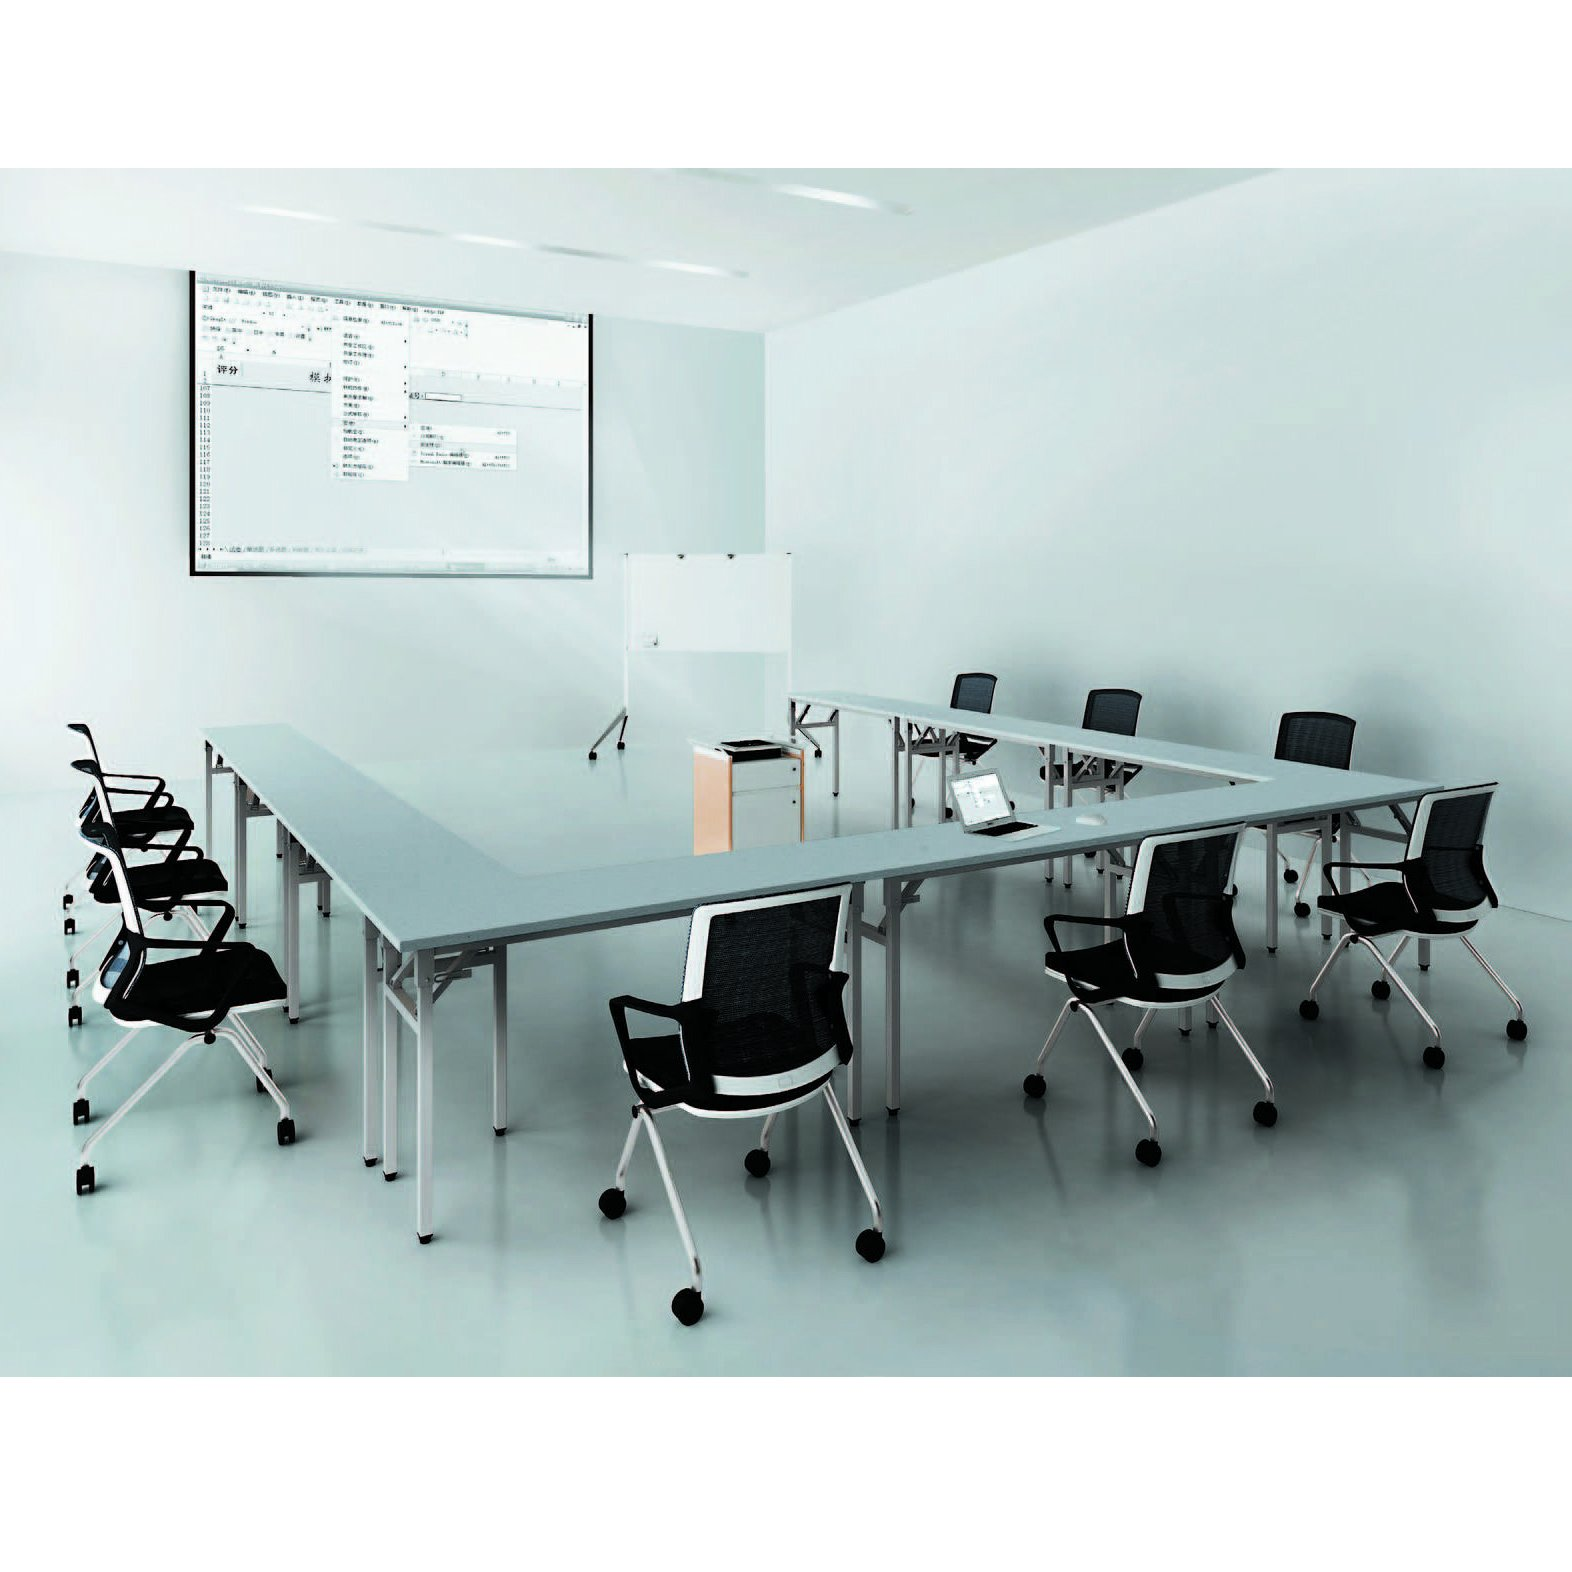 Sunon Folding Training Table 55'' Rectangle Wood Folding Table for Training/Meeting Room (White, 55-Inch Length) by Sunon (Image #7)